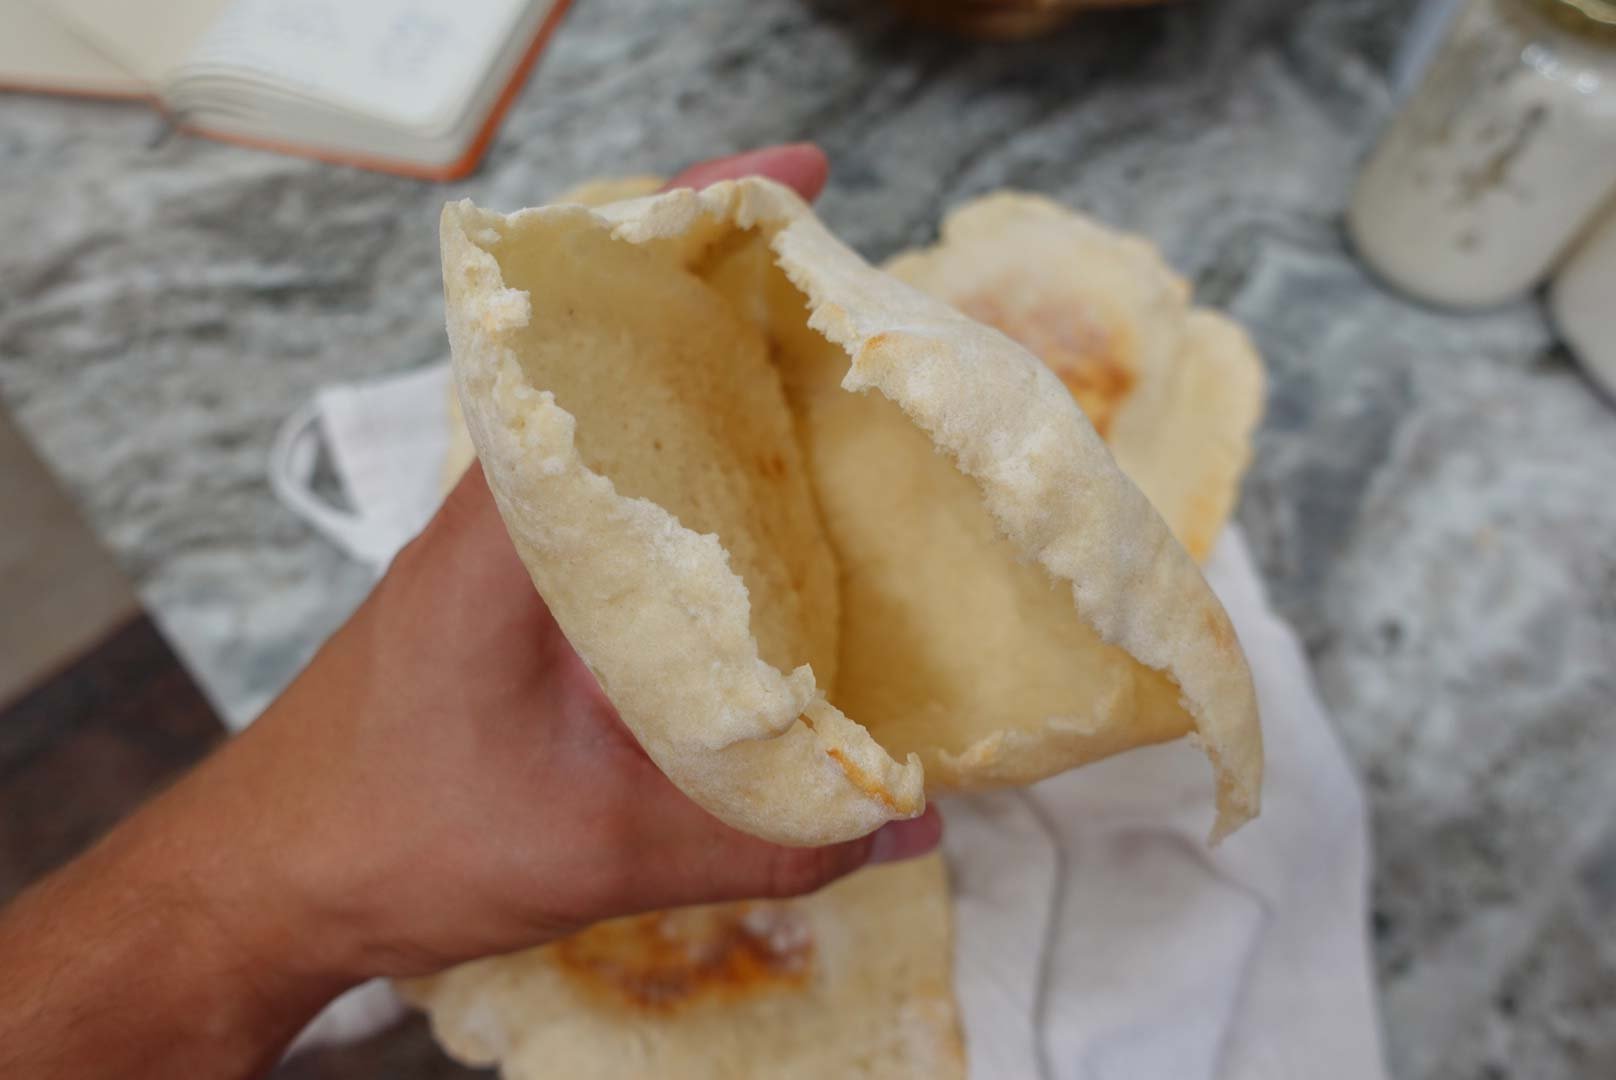 Pita pocket with no yeast